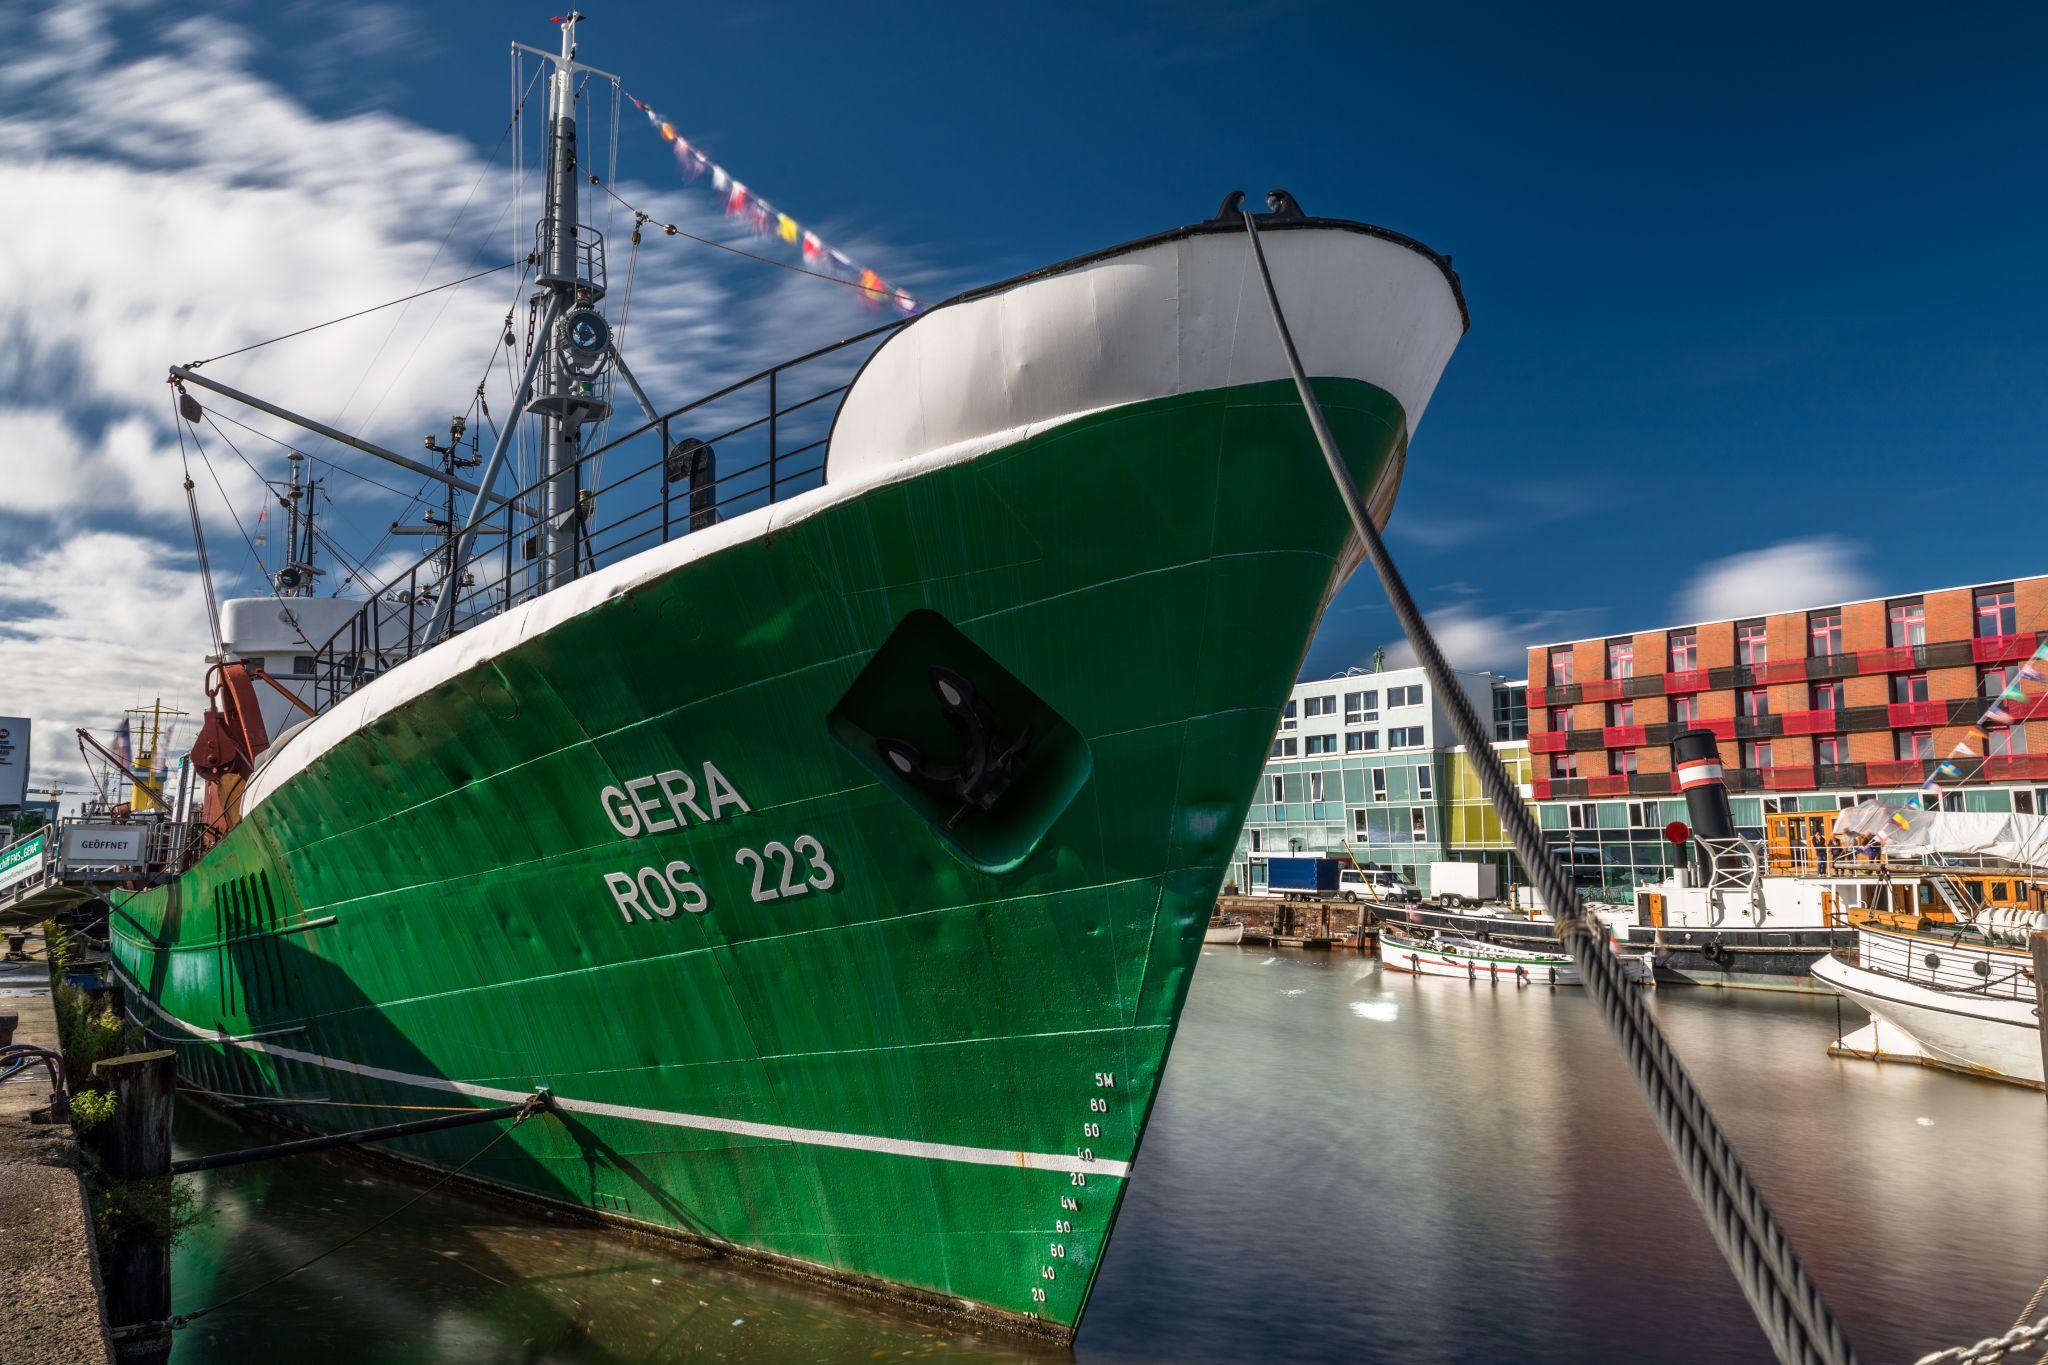 Museumsschiff FMS Gera, Fischereihafen, Bremerhaven, Germany